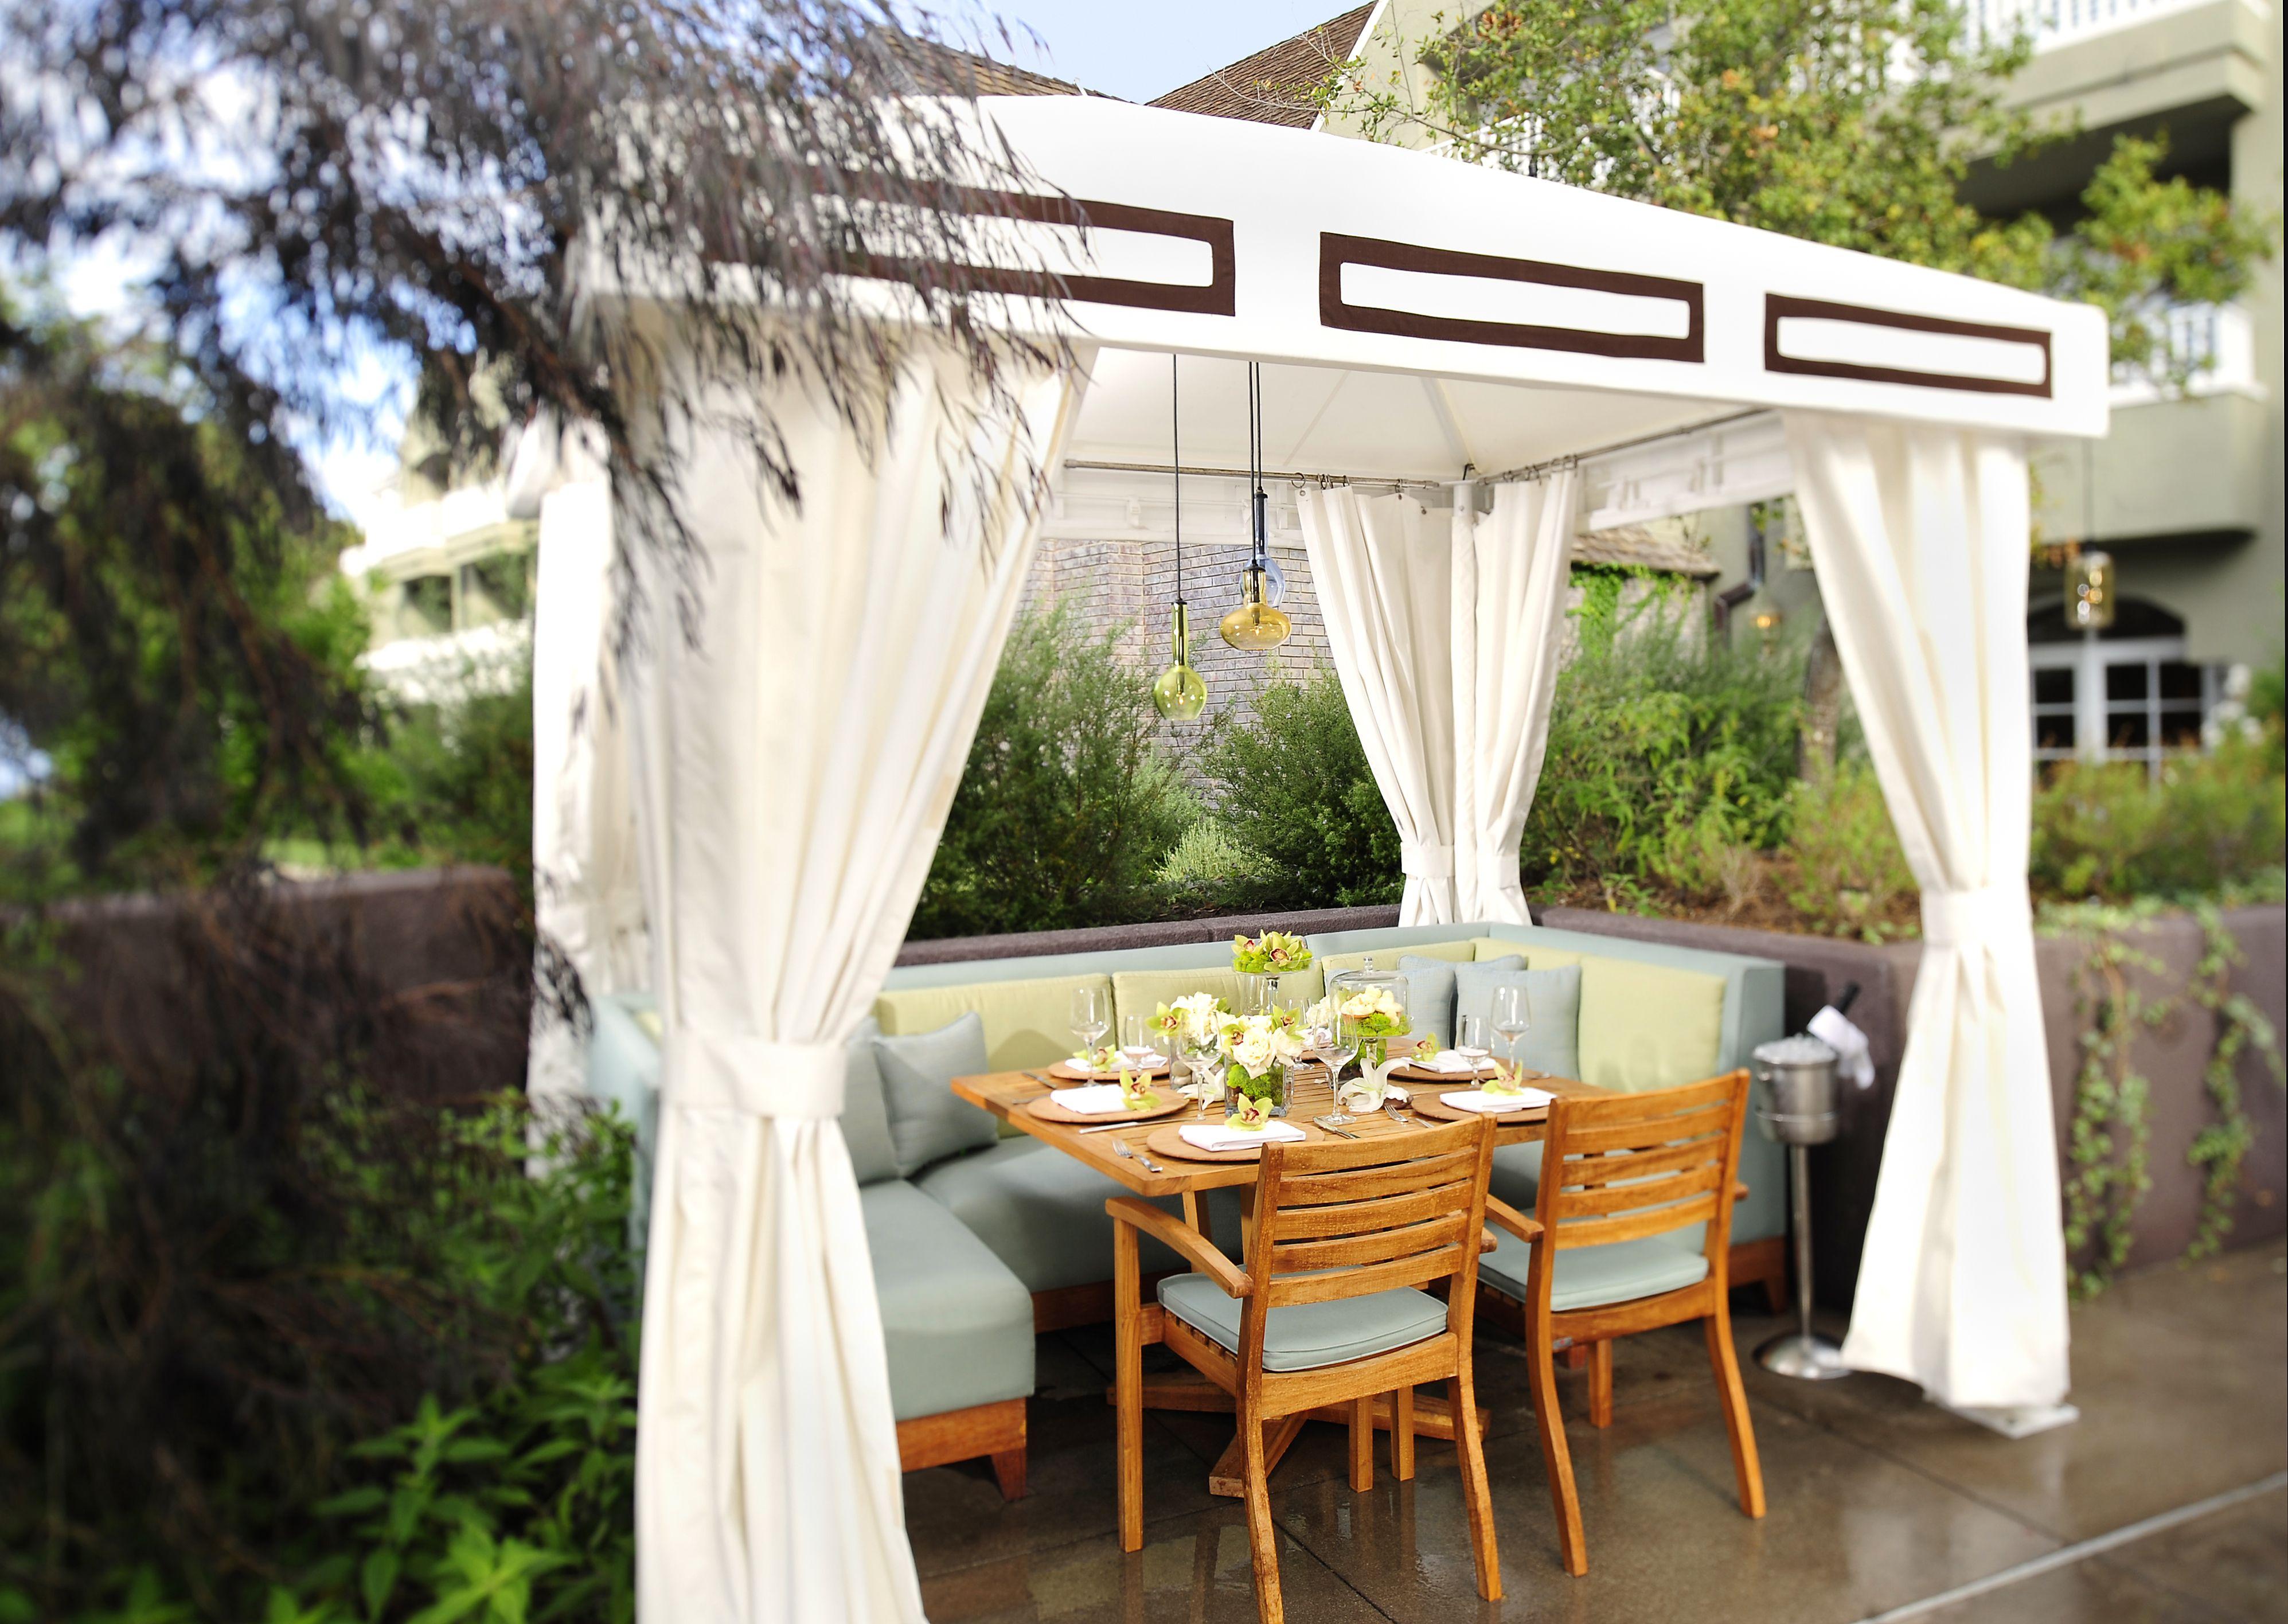 Beach wedding venues in san diego   Best Romantic Restaurants in San Diego